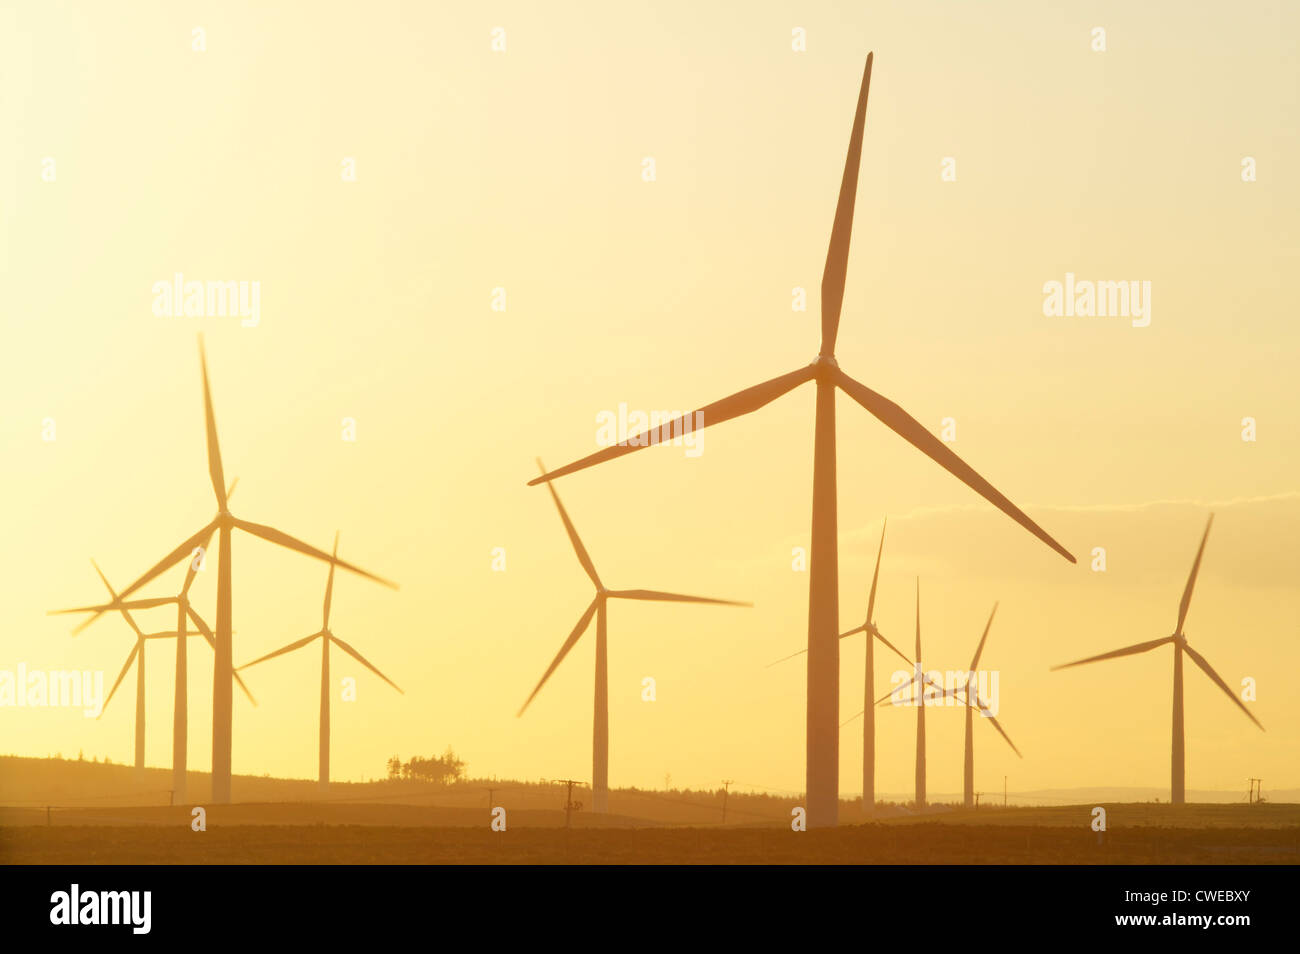 Black Law Wind Farm, near Forth, South Lanarkshire, Scotland, UK - Stock Image